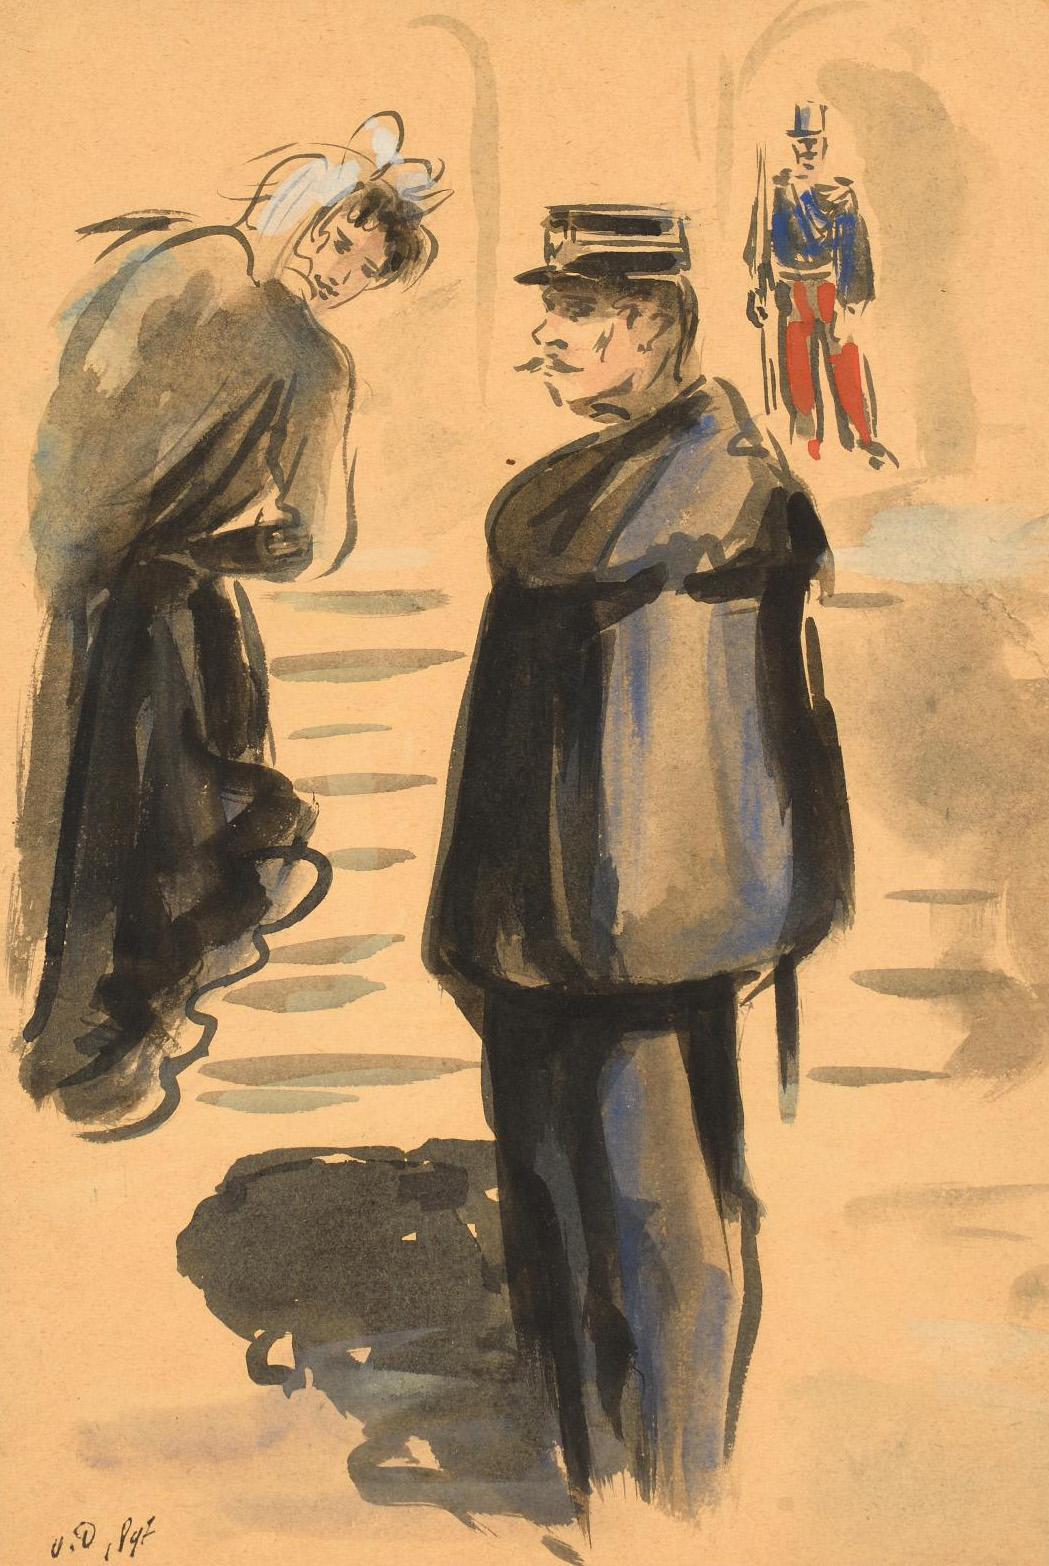 "Kees Van Dongen (1877-1968), Scène de rue (Street scene), 1897, watercolor and wash, signed with the initials ""V.D."", 29.2 x 19.7 cm/11.4"